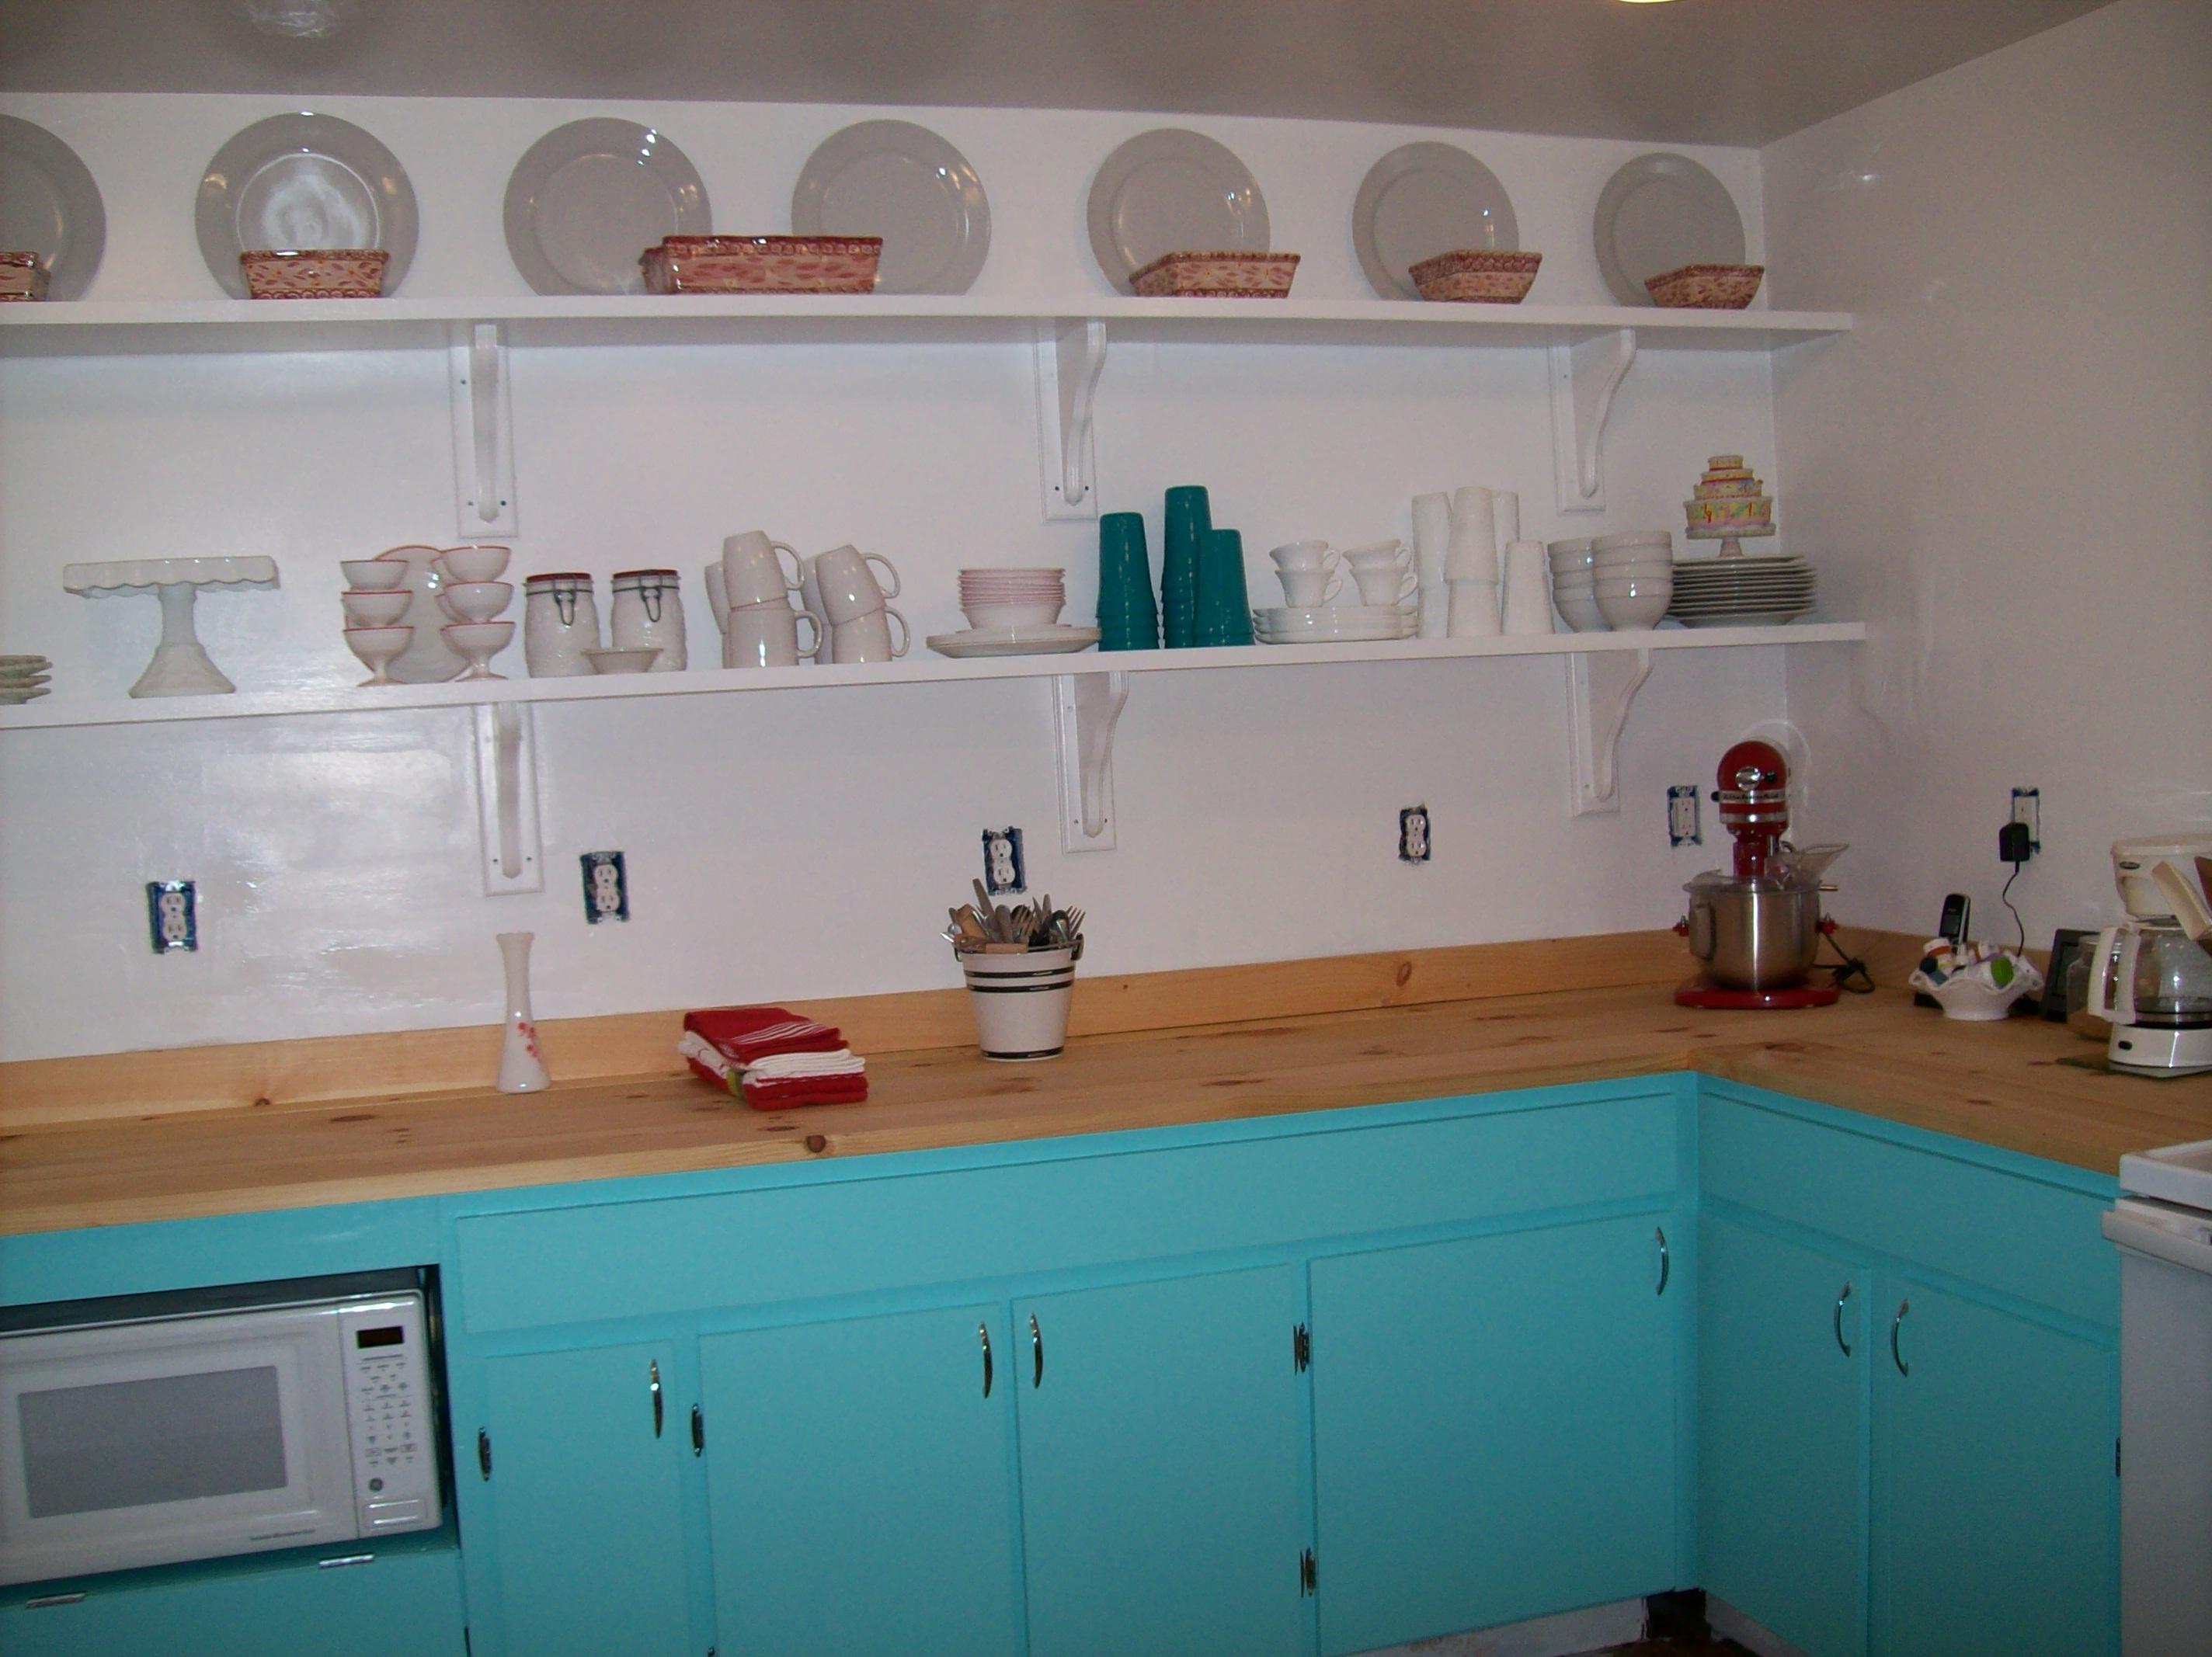 Recycle Kitchen Cabinets Best Kitchen Gallery | Rachelxblog lowe s ...